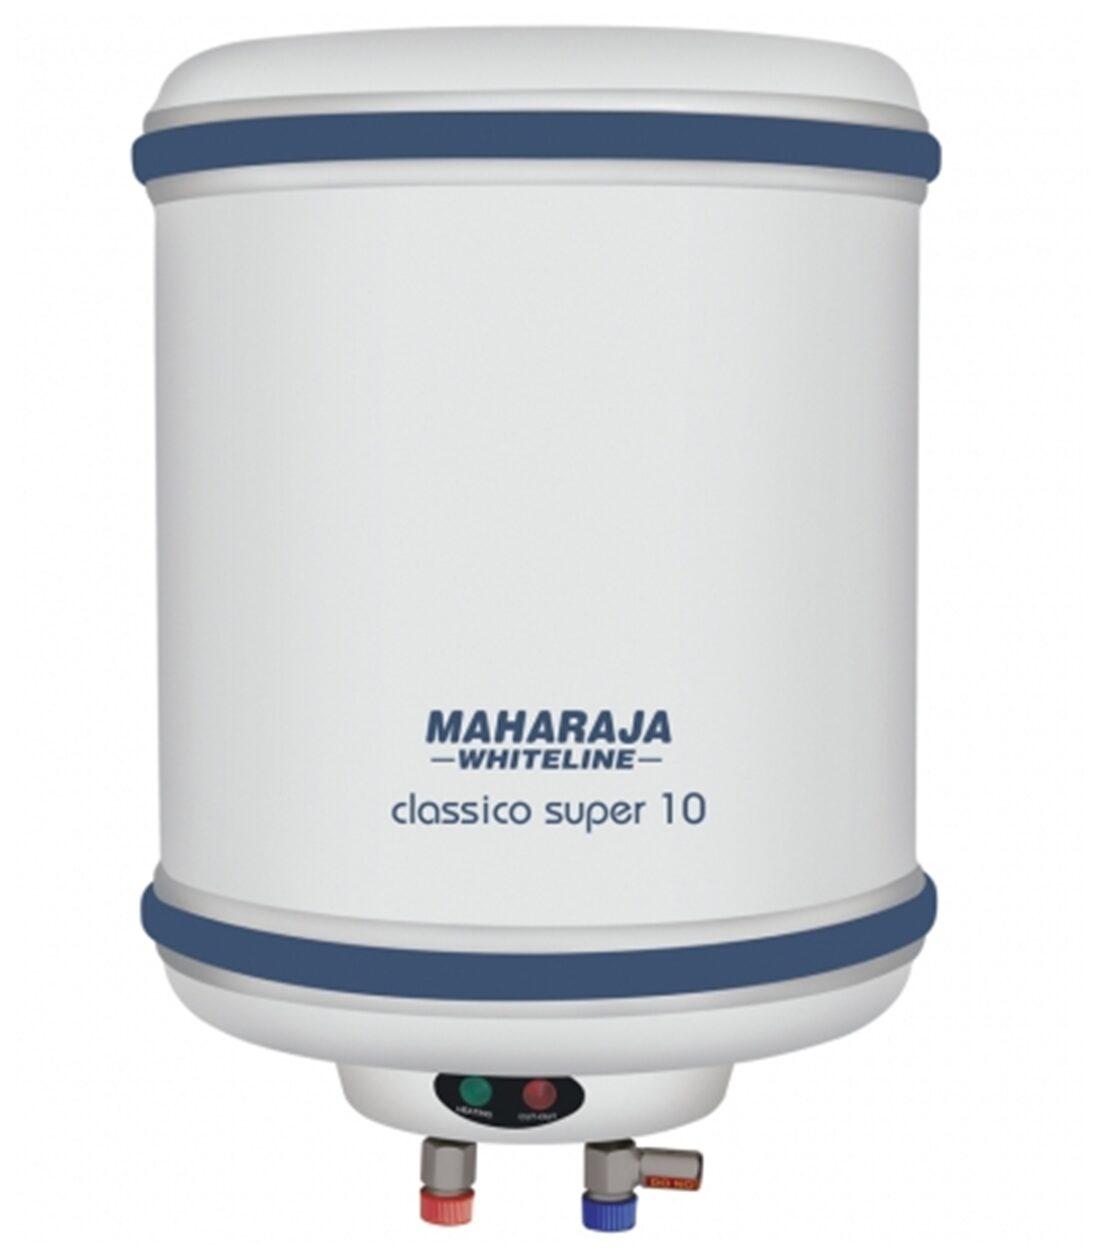 maharaja whiteline 10L Storage Water Geyser (Classico Super WH-142, Blue & White)